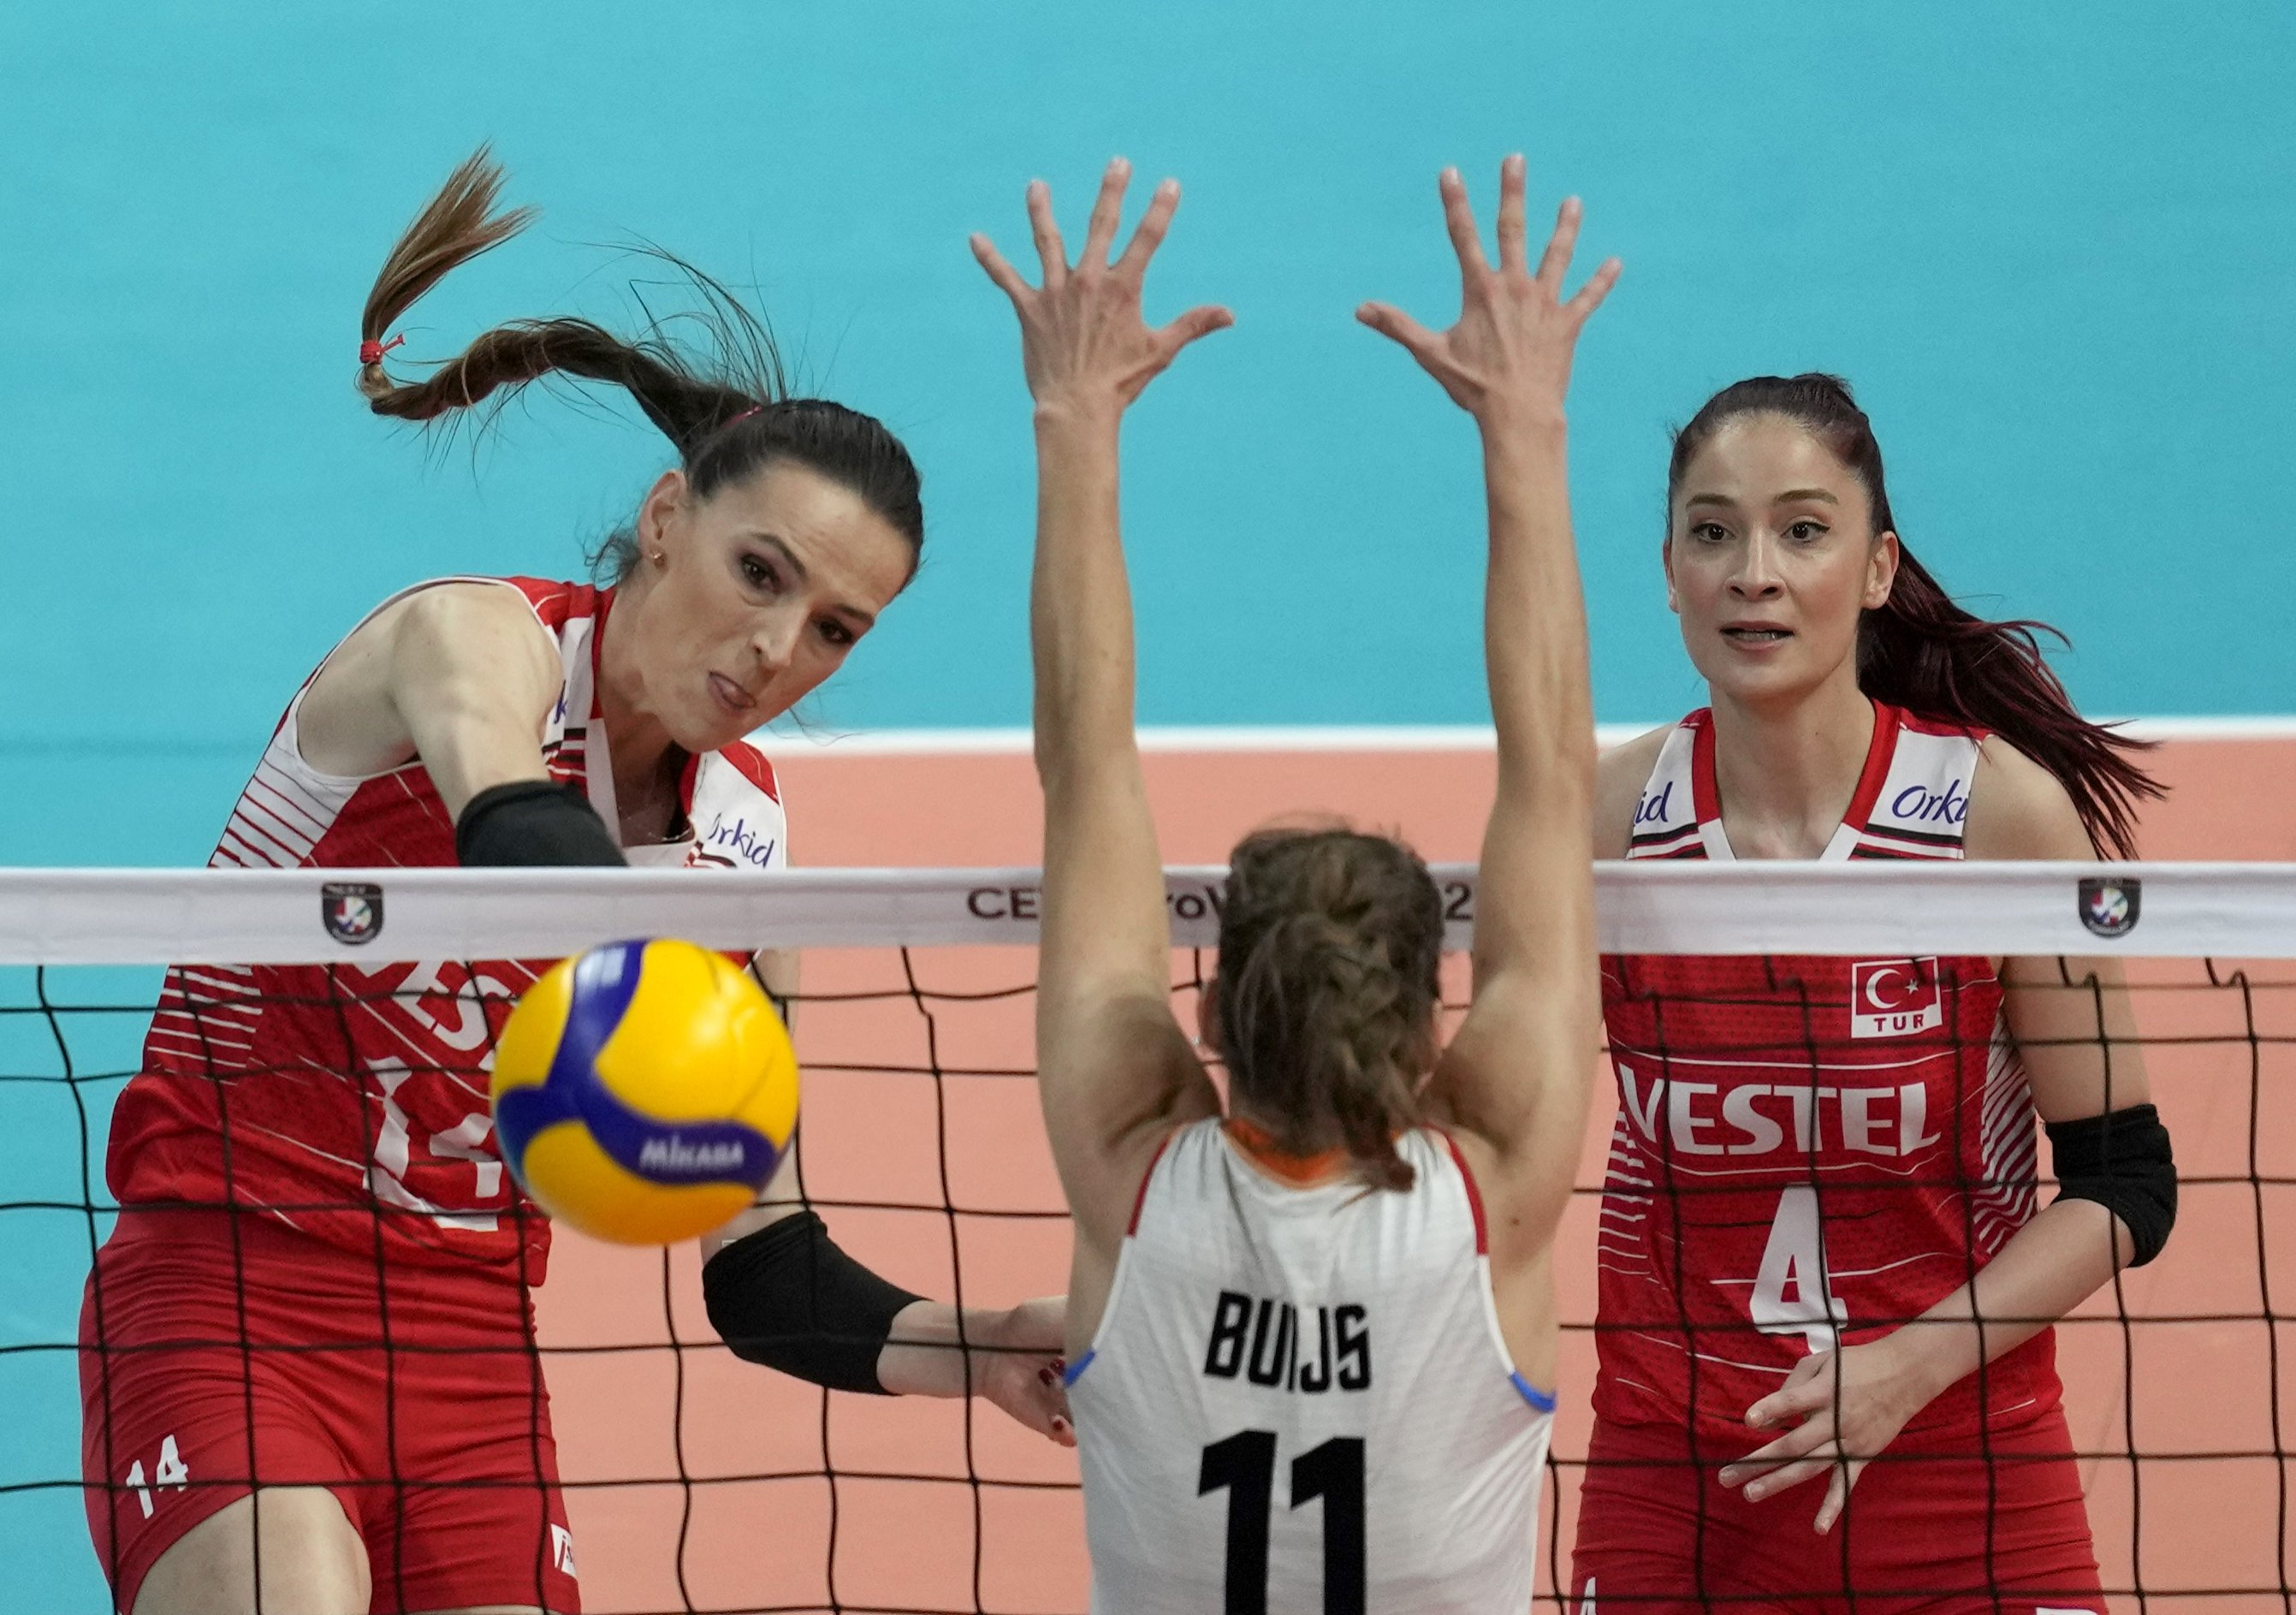 Turkey's Eda Erdem Dündar (L) spikes the ball against the Netherlands' Anne Buijs during the 2021 Women's European Volleyball Championship bronze medal match between Turkey and the Netherlands, in Belgrade, Serbia, Sept. 4, 2021. (AP Photo)